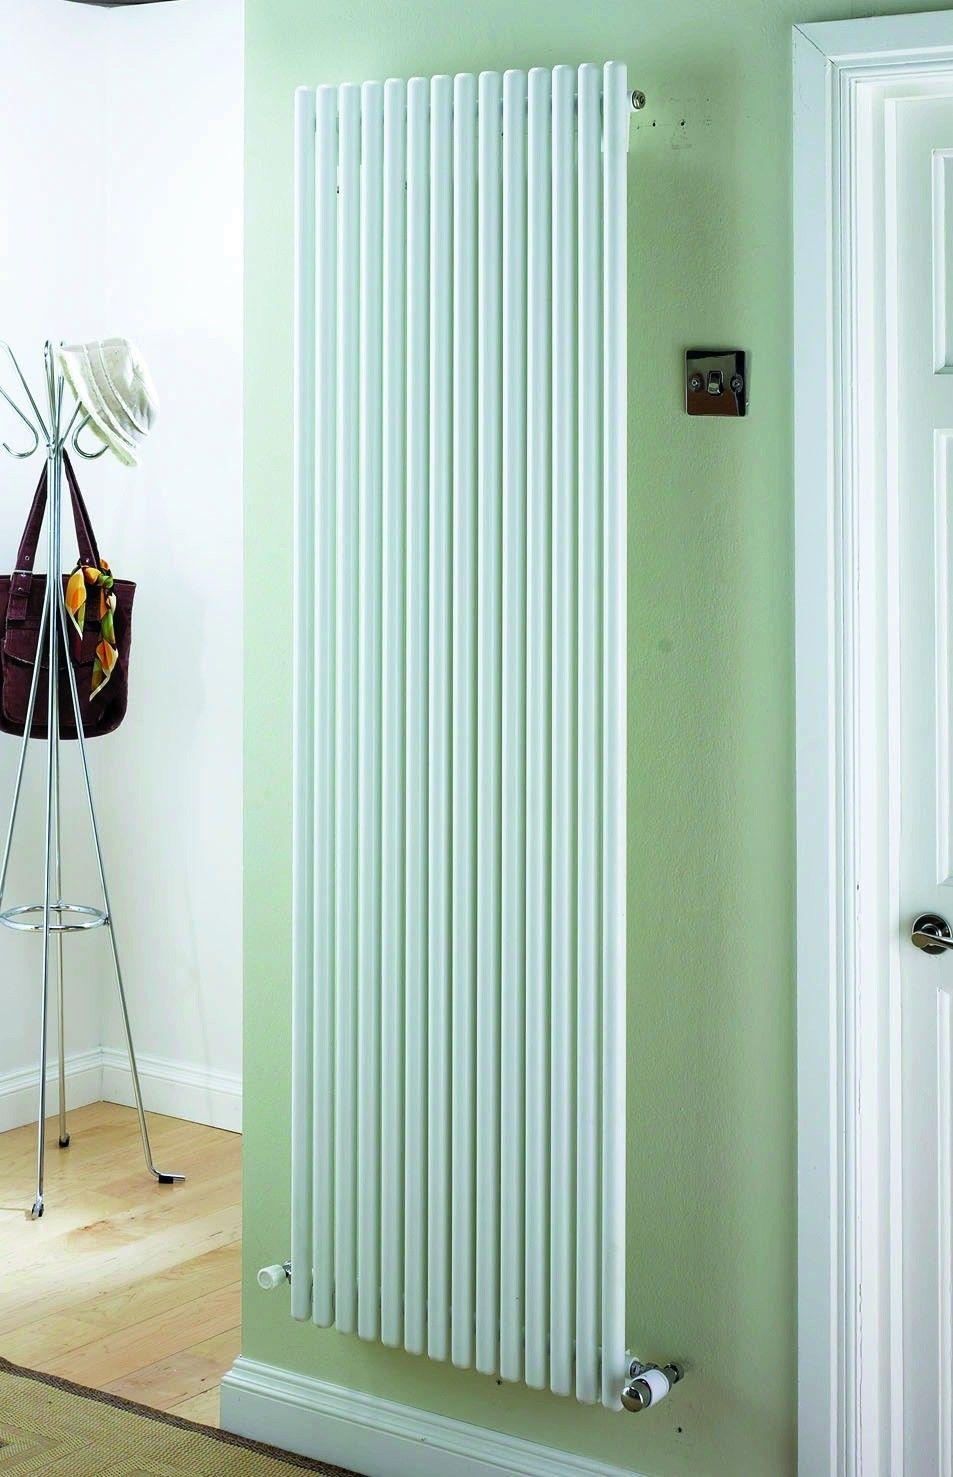 r hrenheizk rper doppellagig 160 x ab 11 cm ab 462 watt r hrenheizk rper. Black Bedroom Furniture Sets. Home Design Ideas